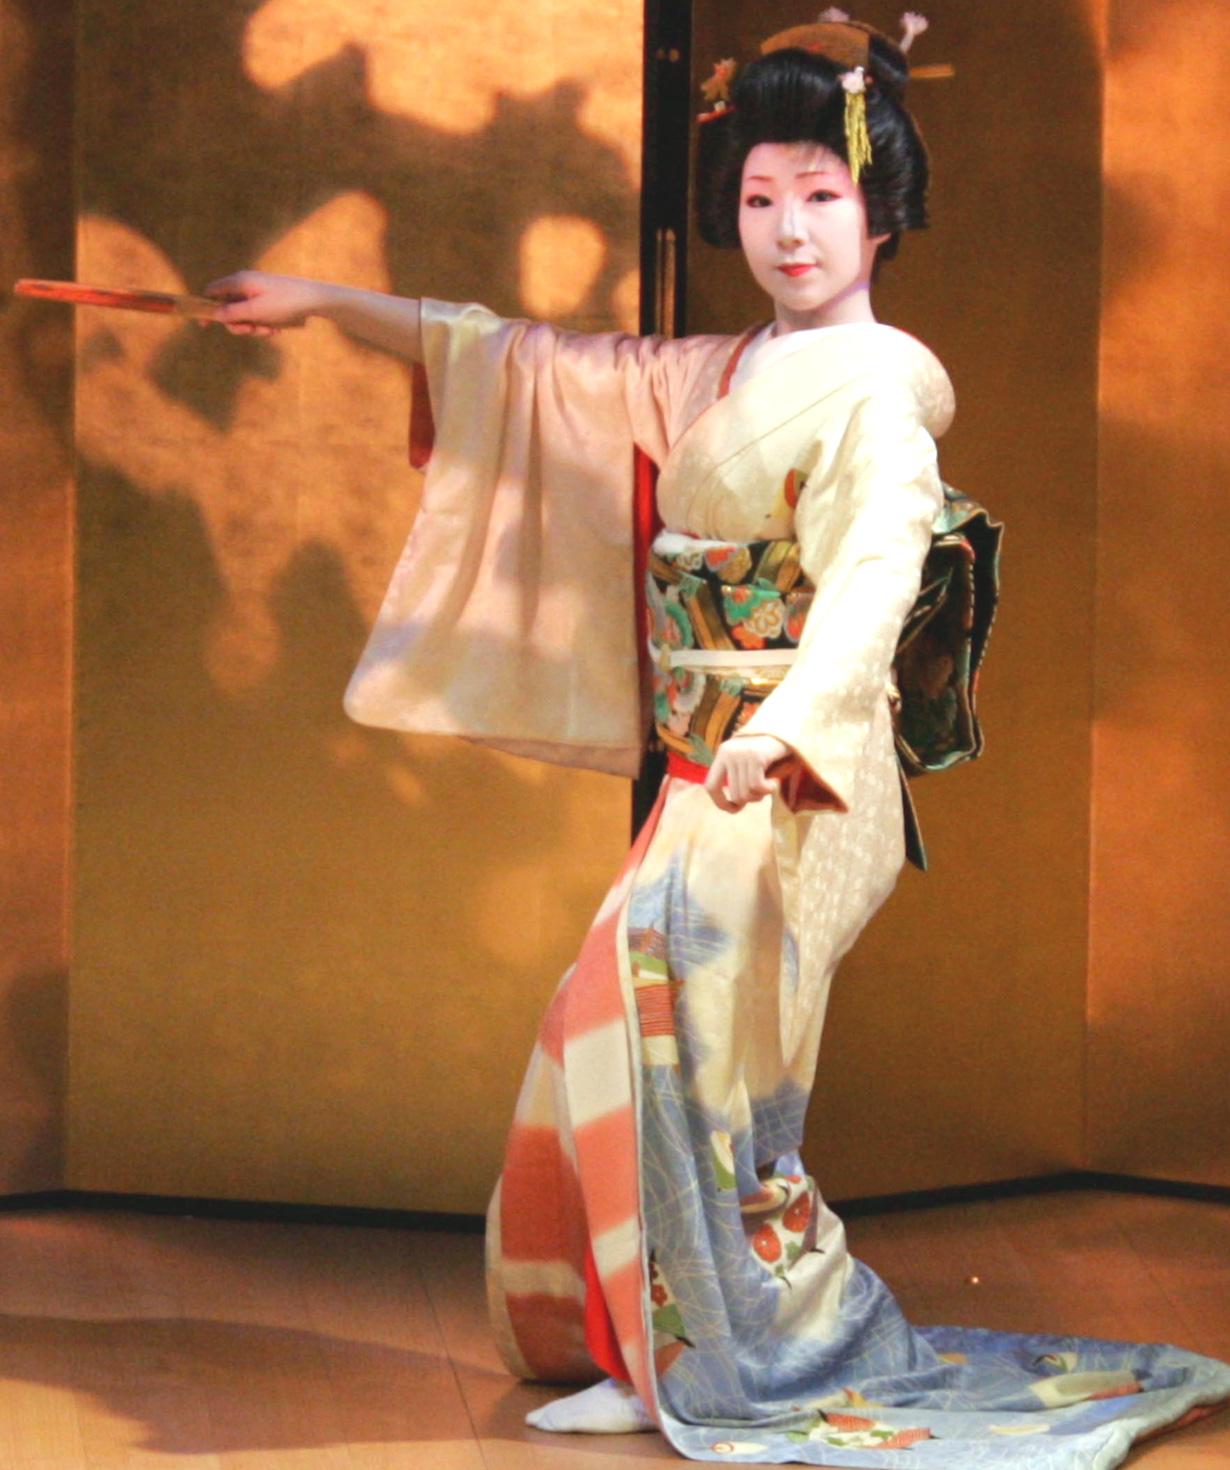 山中座舞台開き「舞初め鑑賞会」_f0040218_14272336.jpg